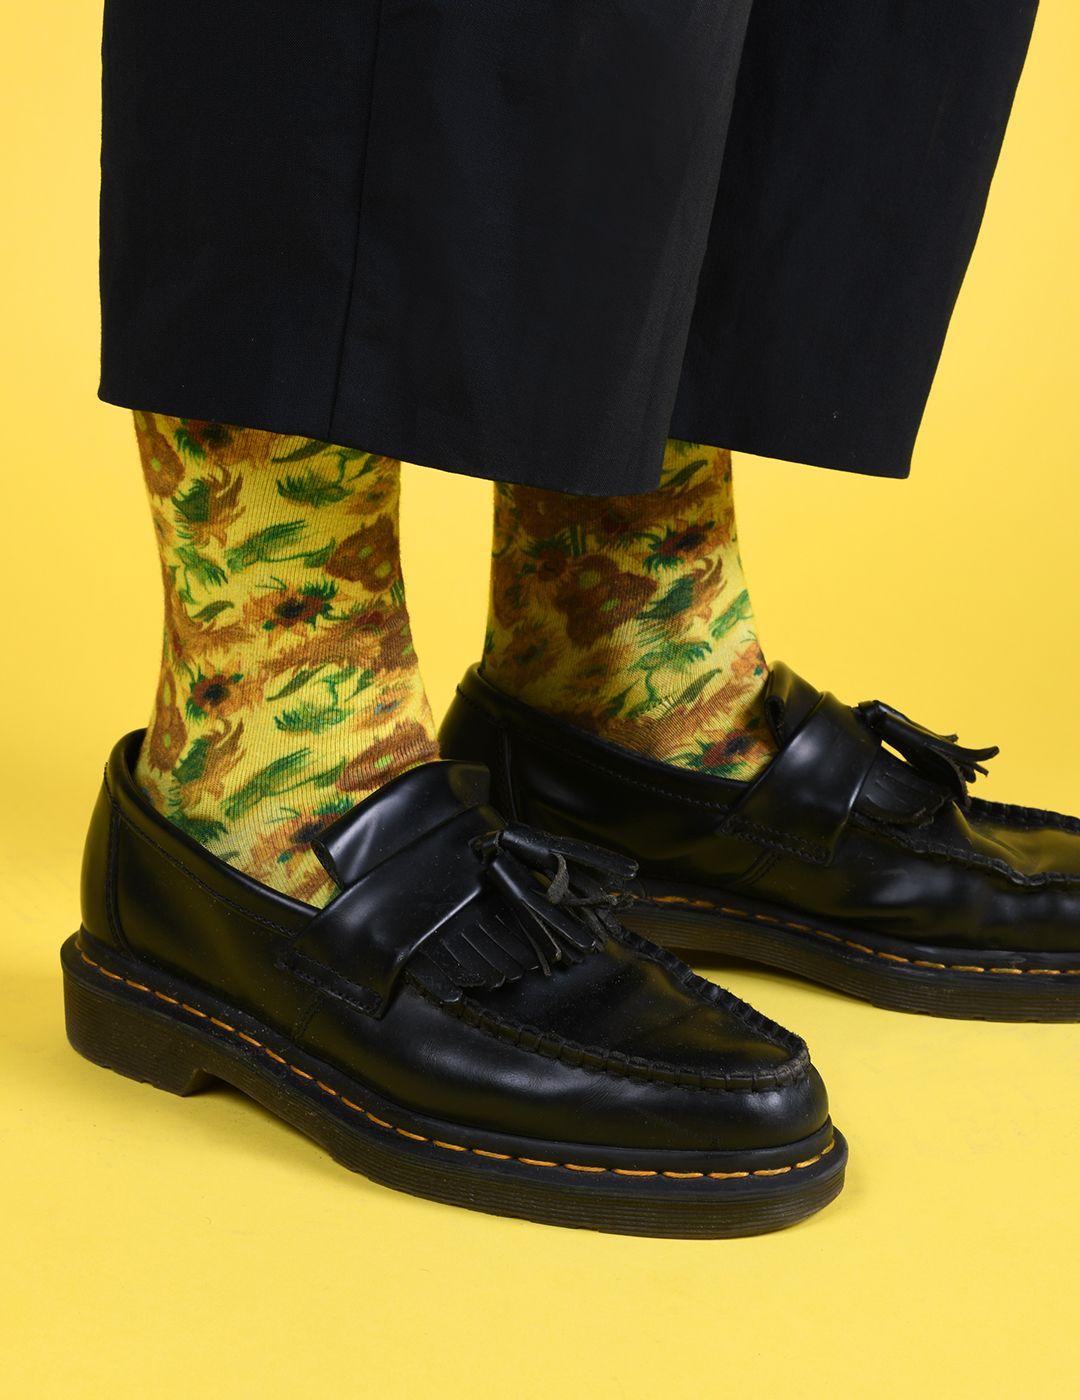 chaussures style docs martens vans gogh